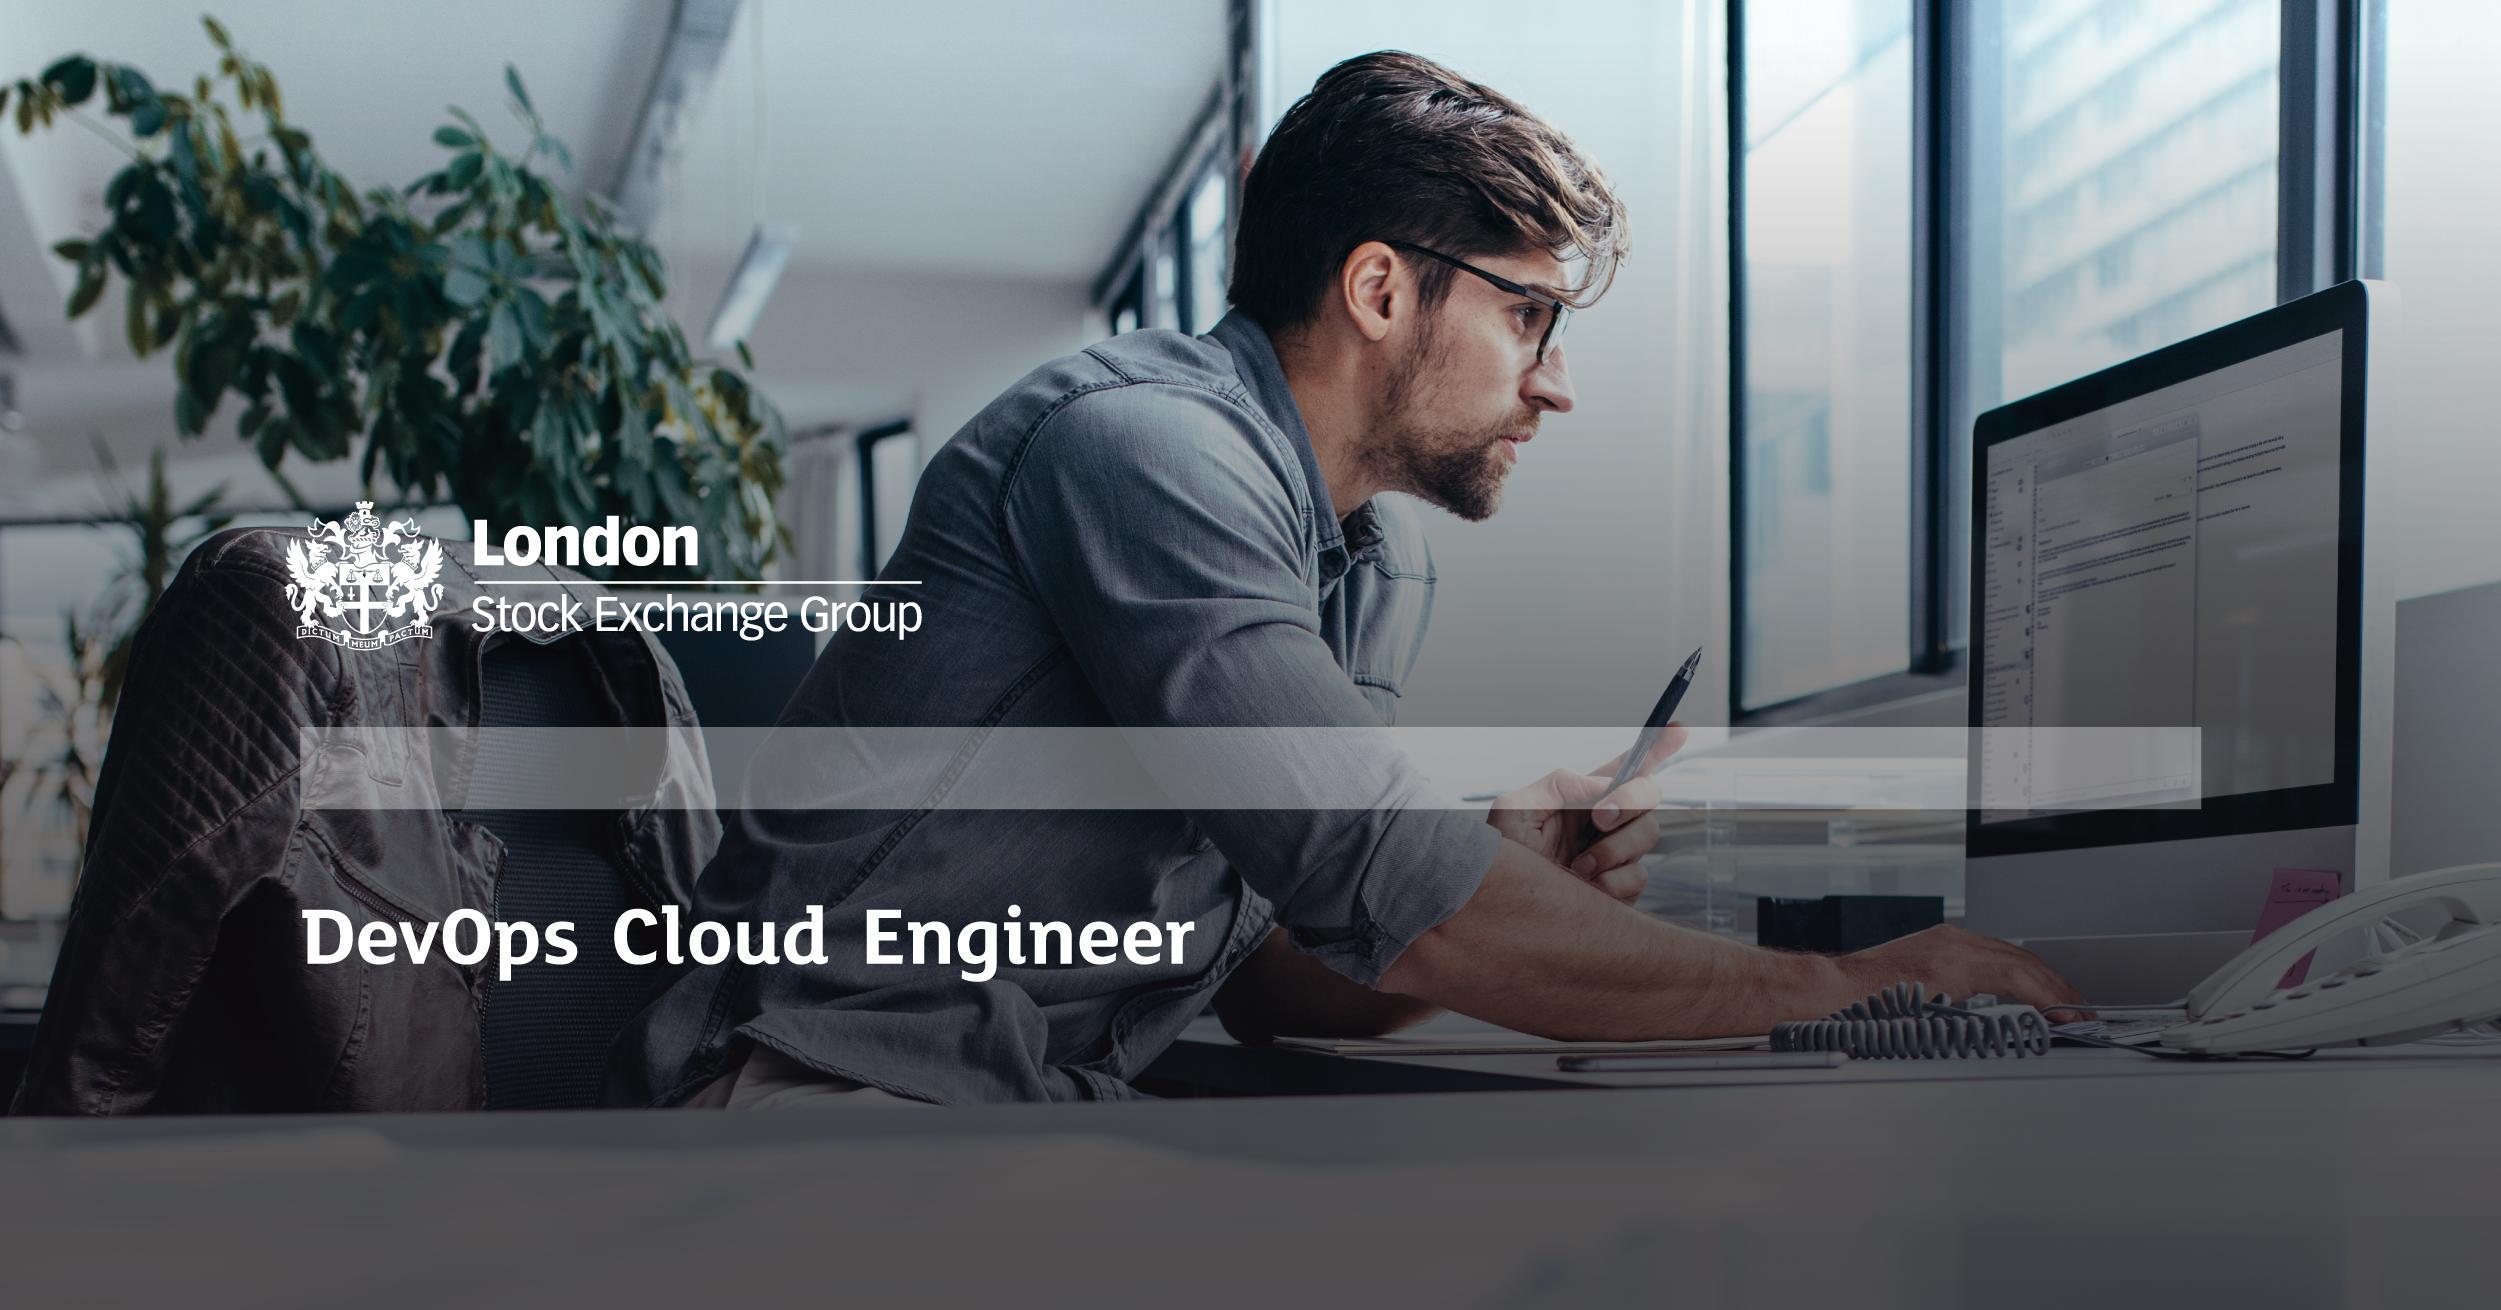 DevOps Cloud Engineer - LSEG Romania